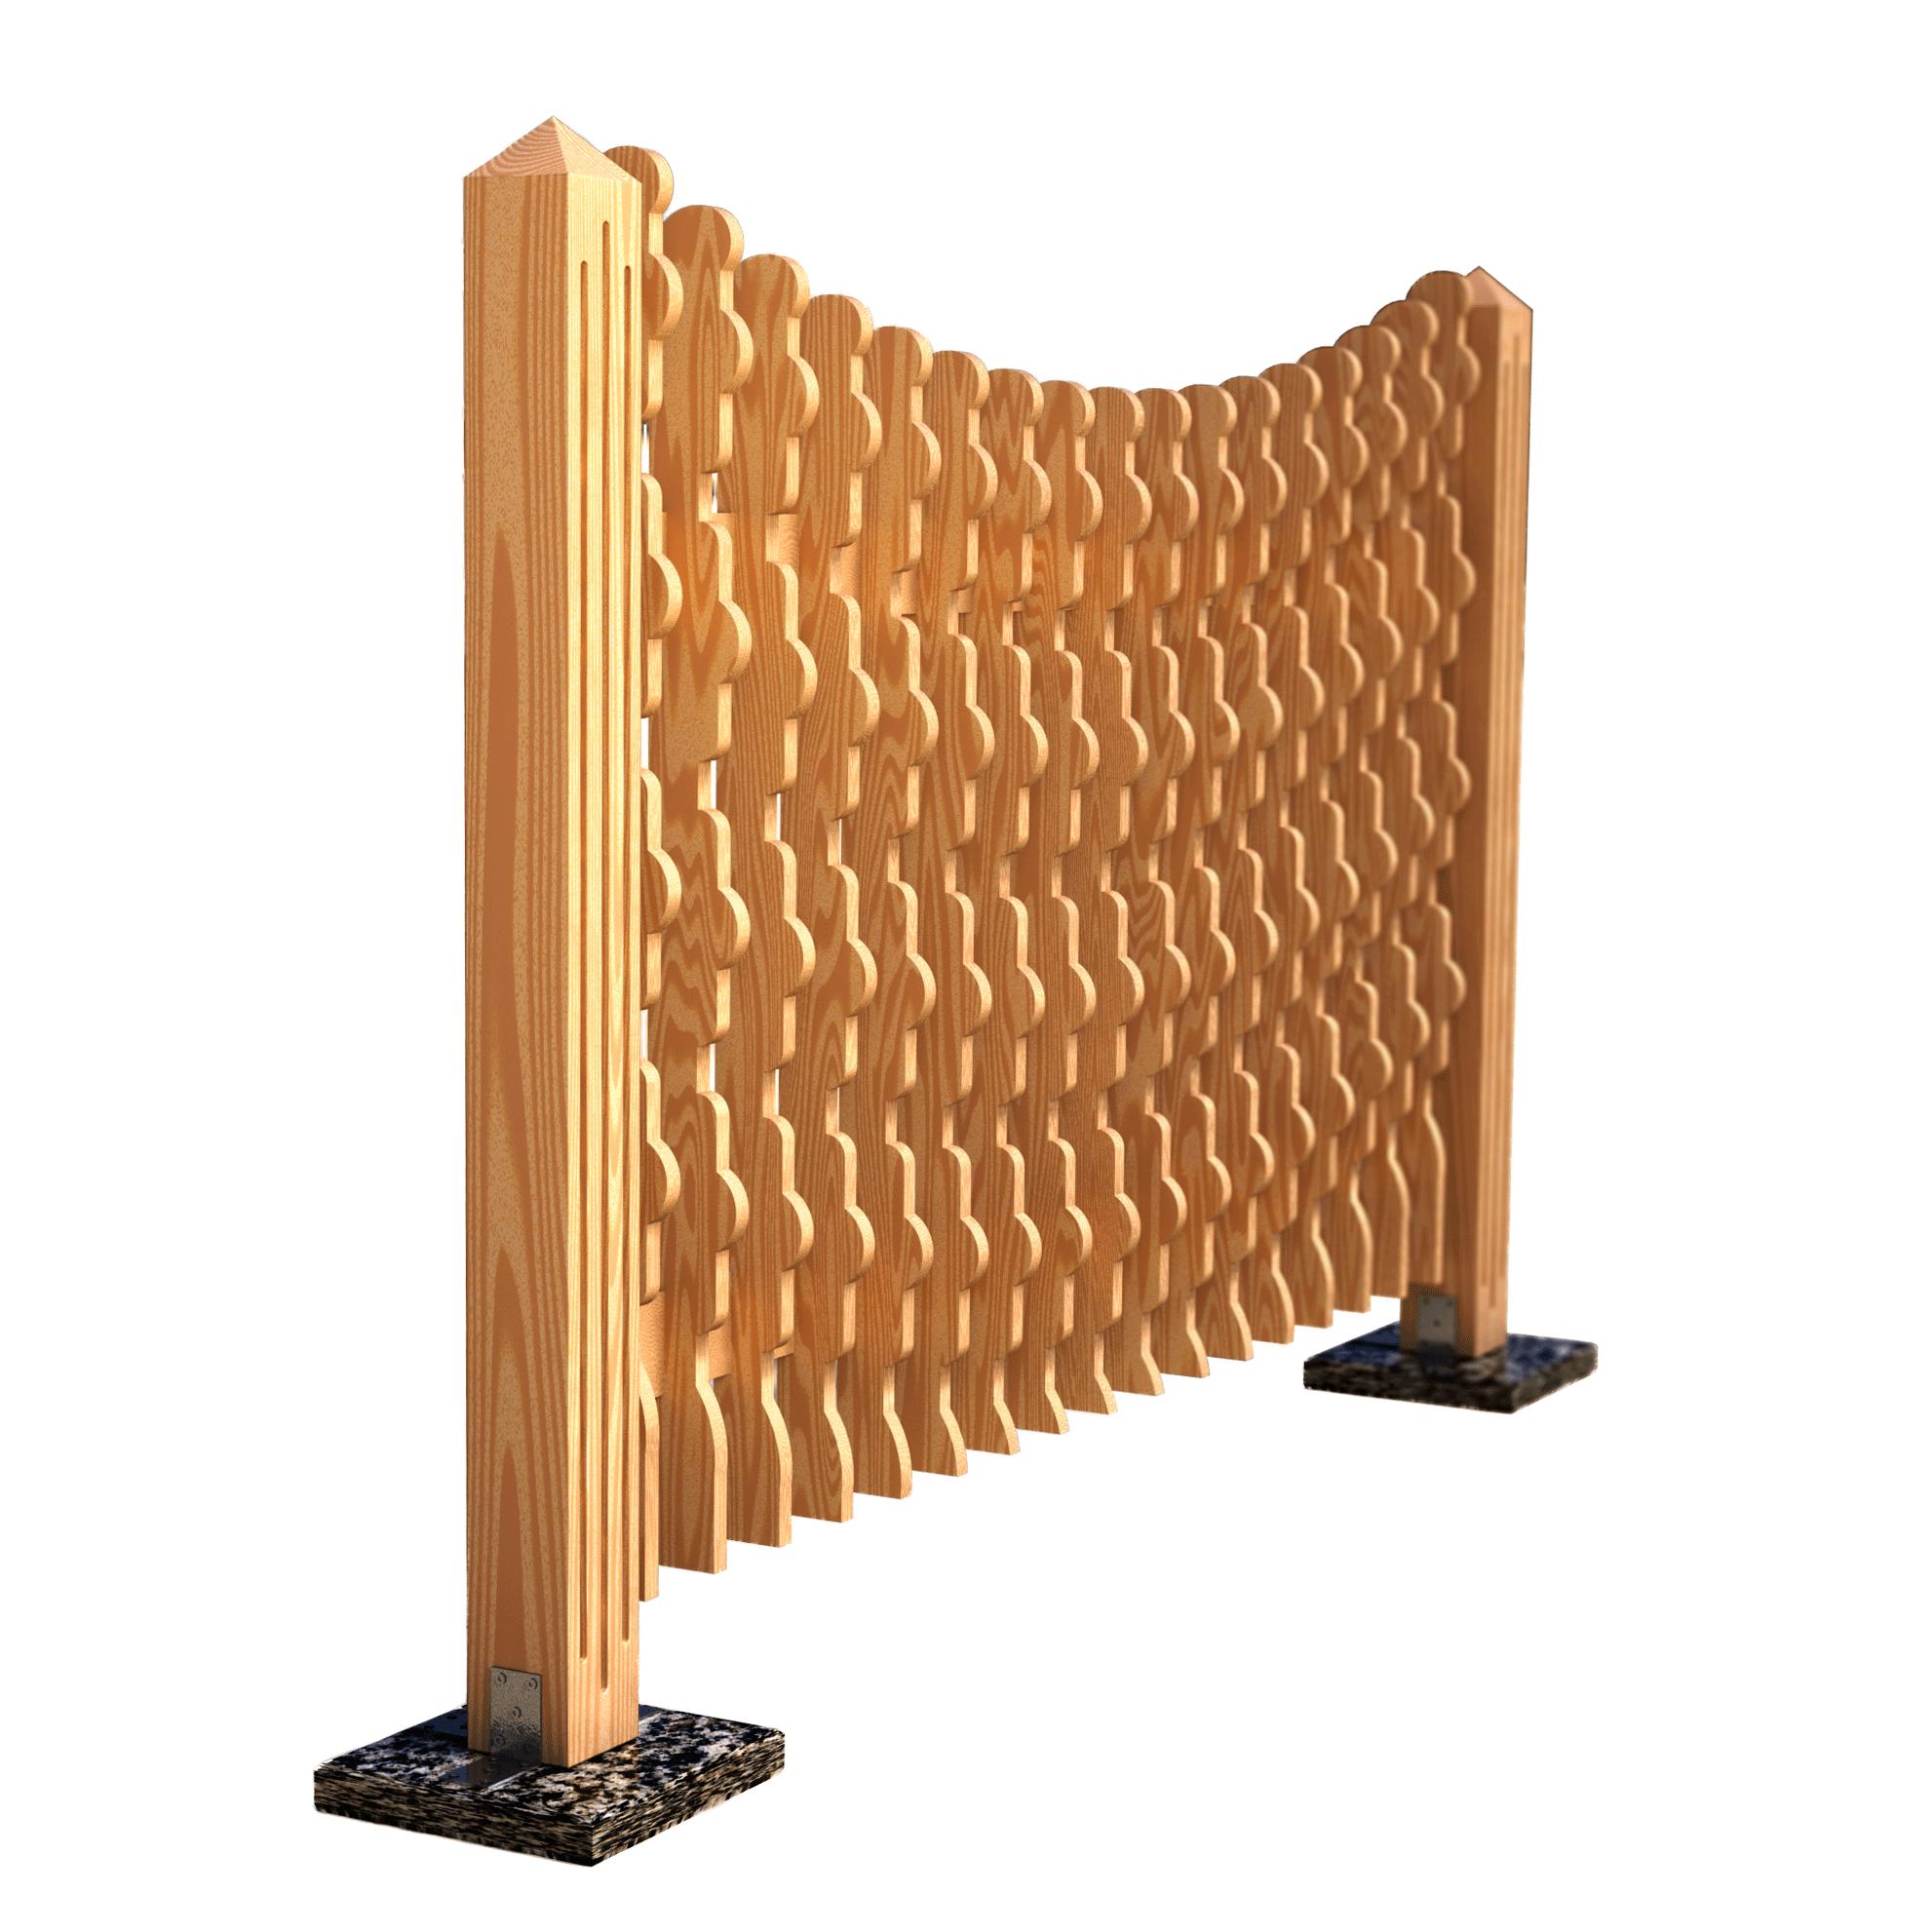 Decorative fence panel axel